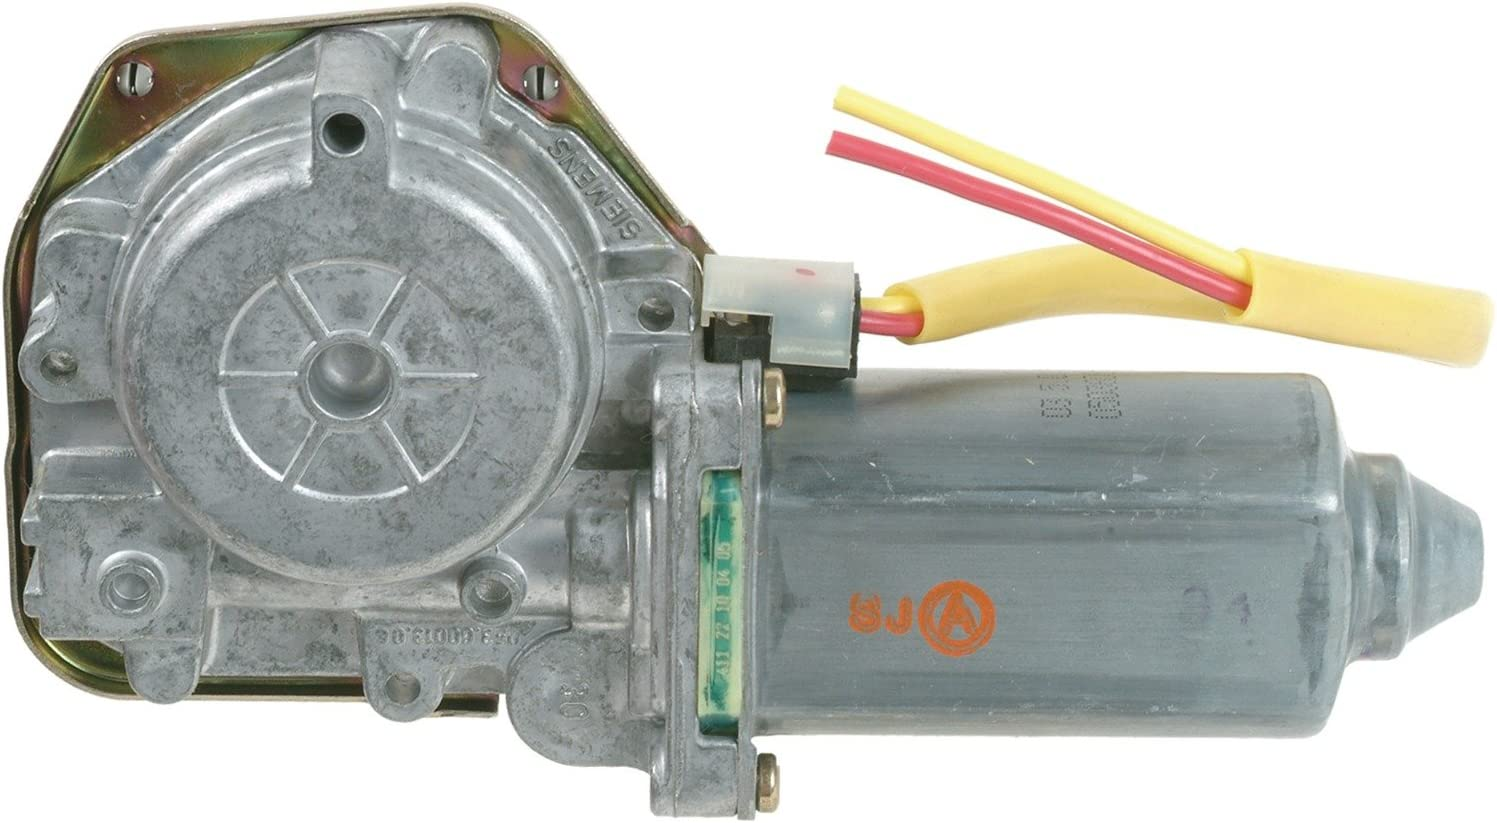 Cardone Select 82-370 New Window Lift Motor